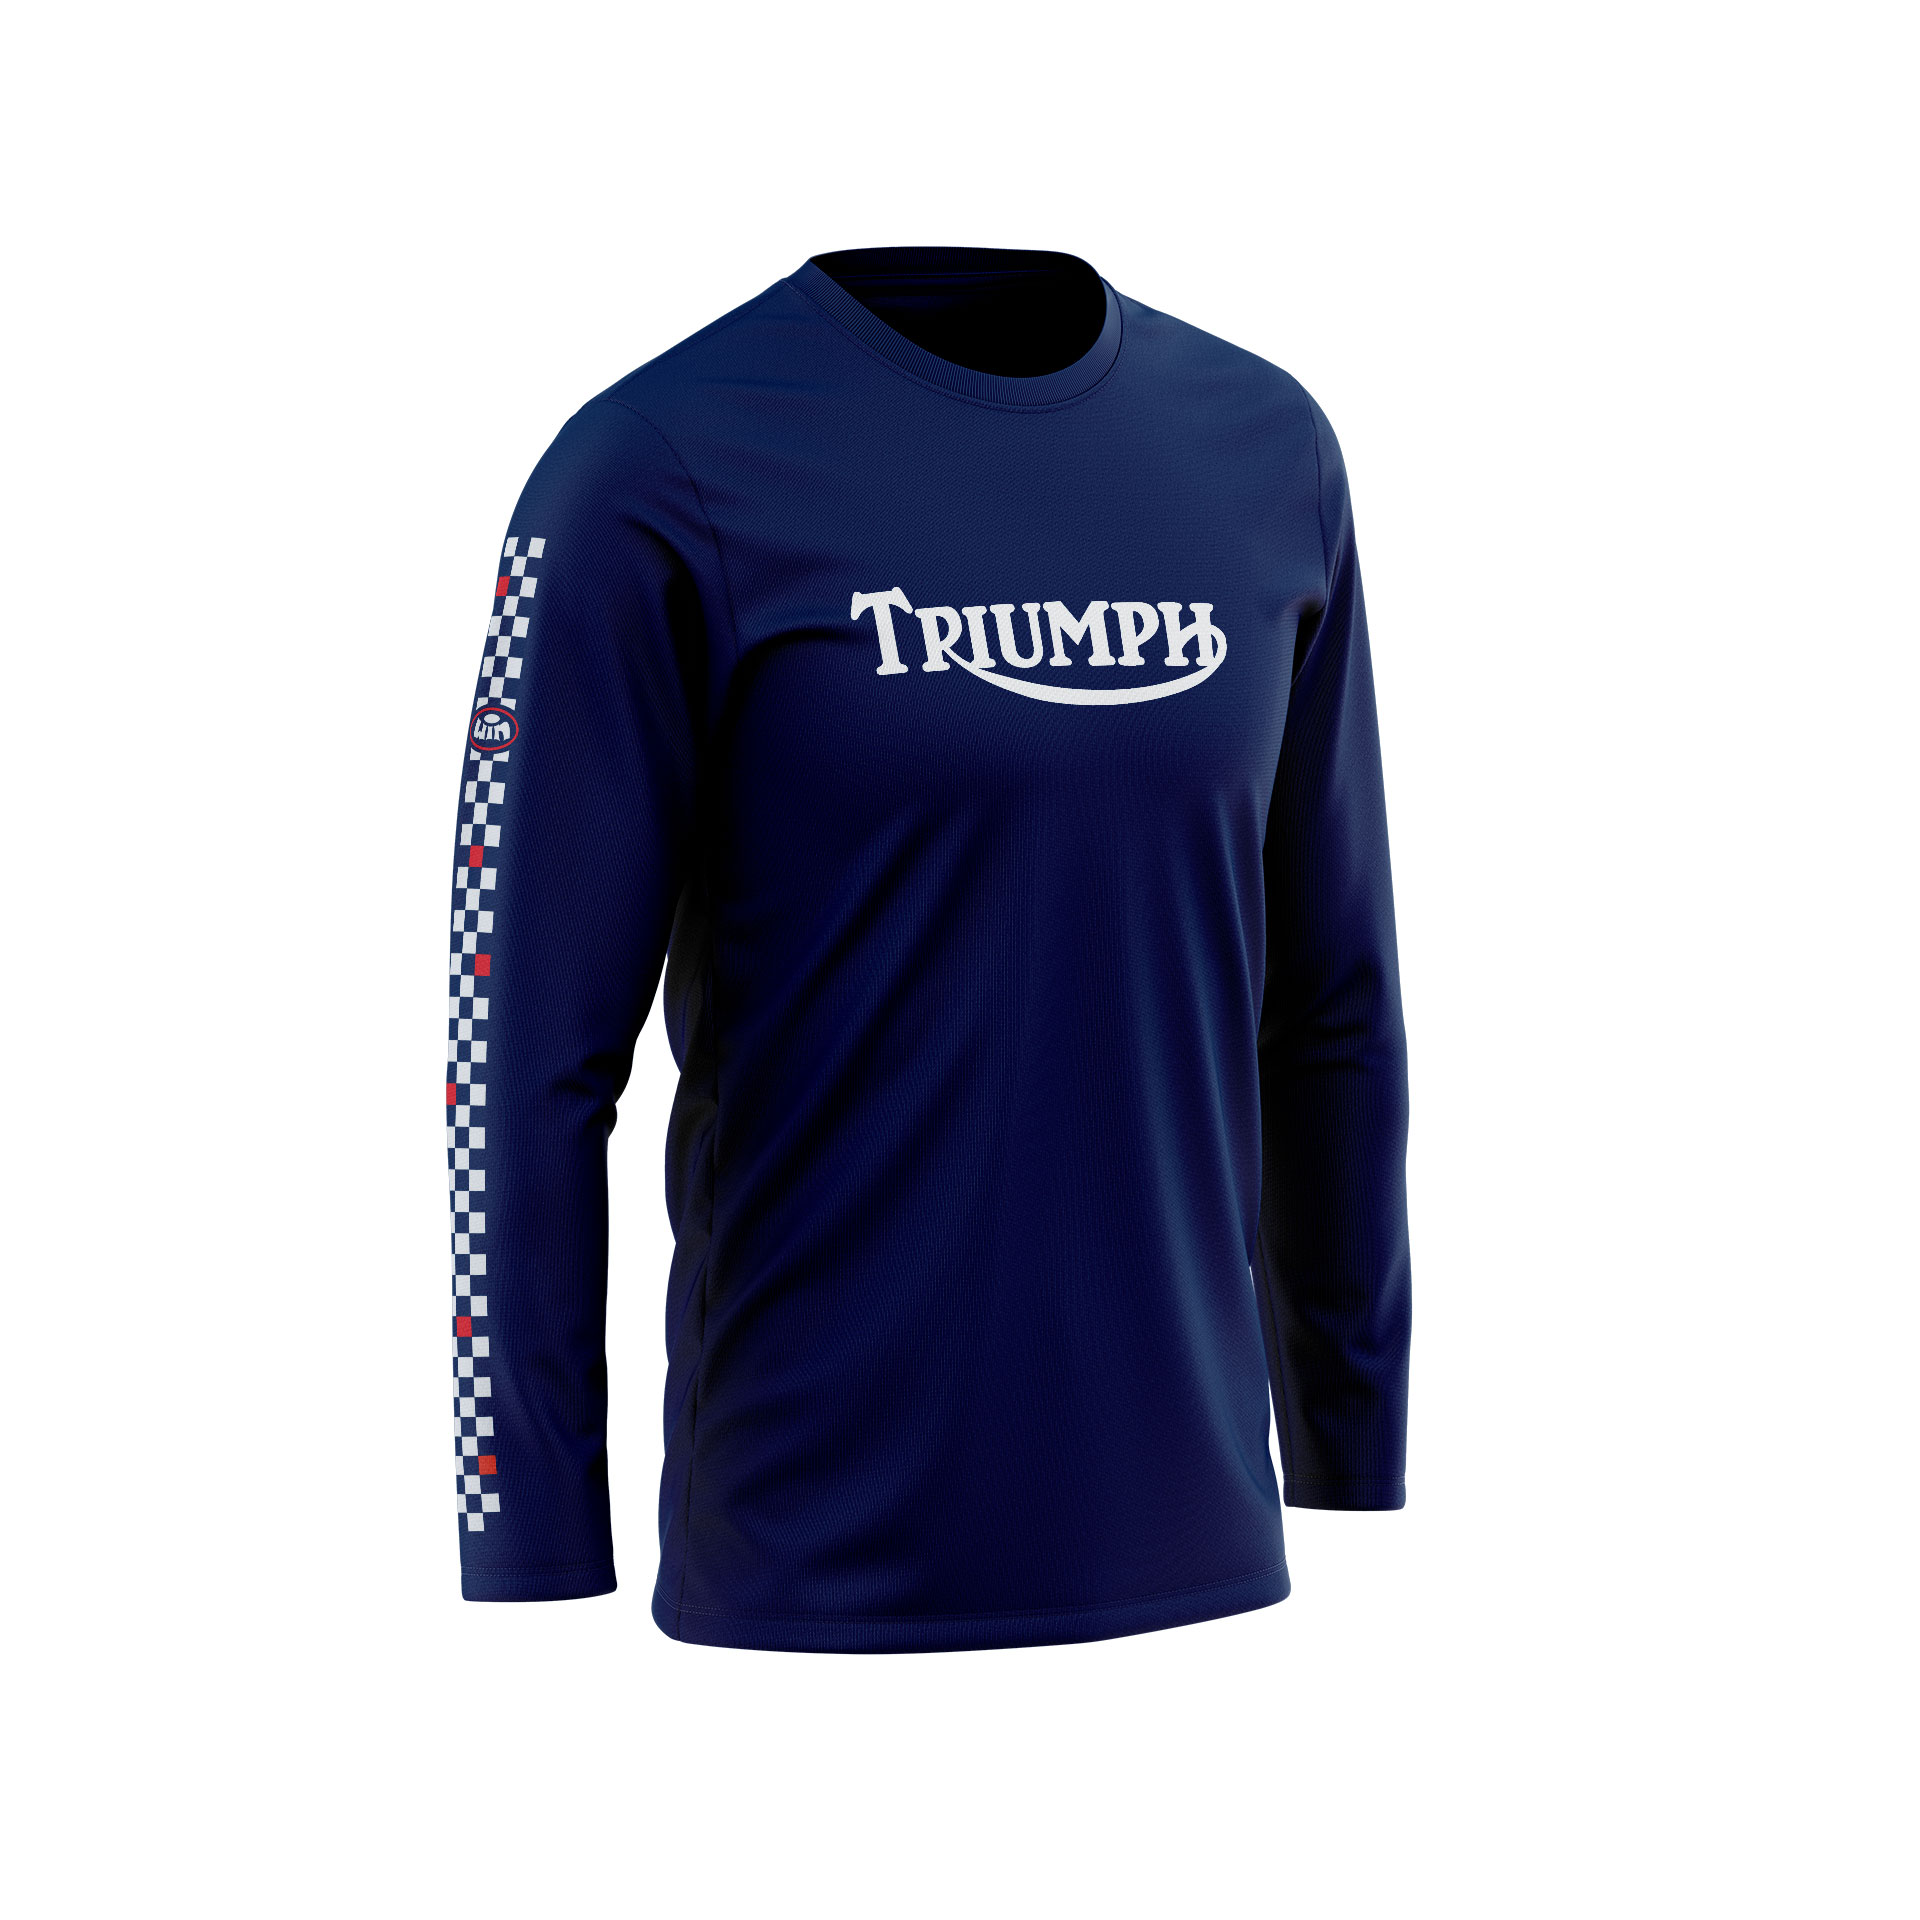 TSLS TRIUMPH Navy - Blanc